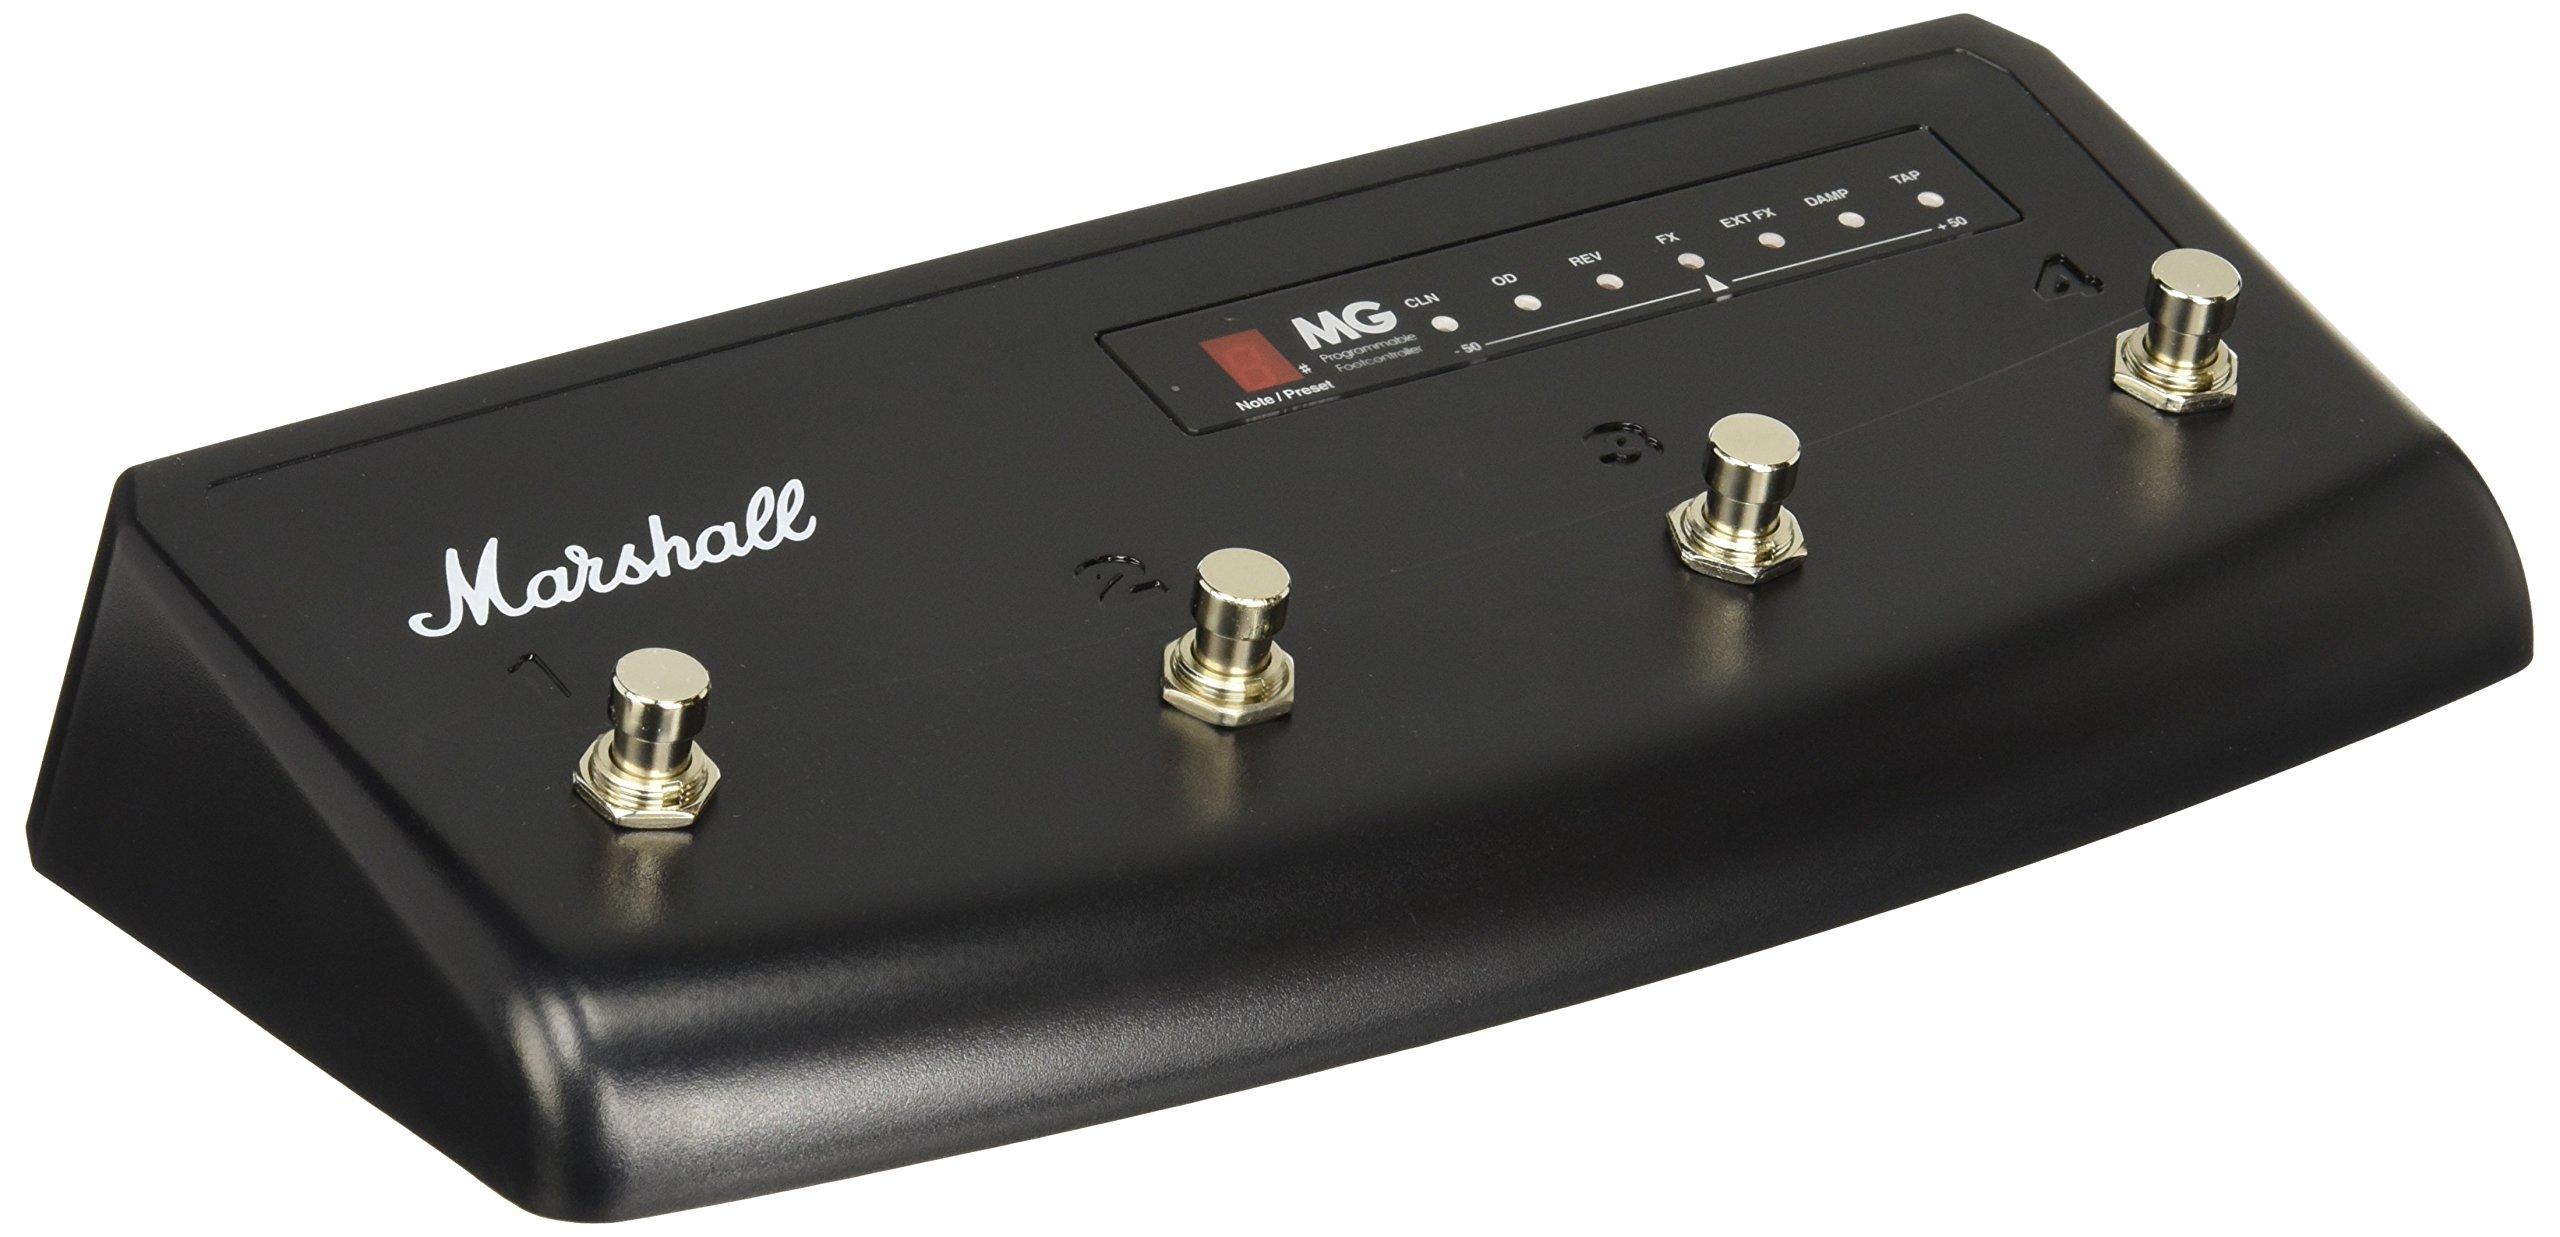 Marshall PEDL-90008 MG15FX/MG30FX/MG50FX/MG101FX Footswitch